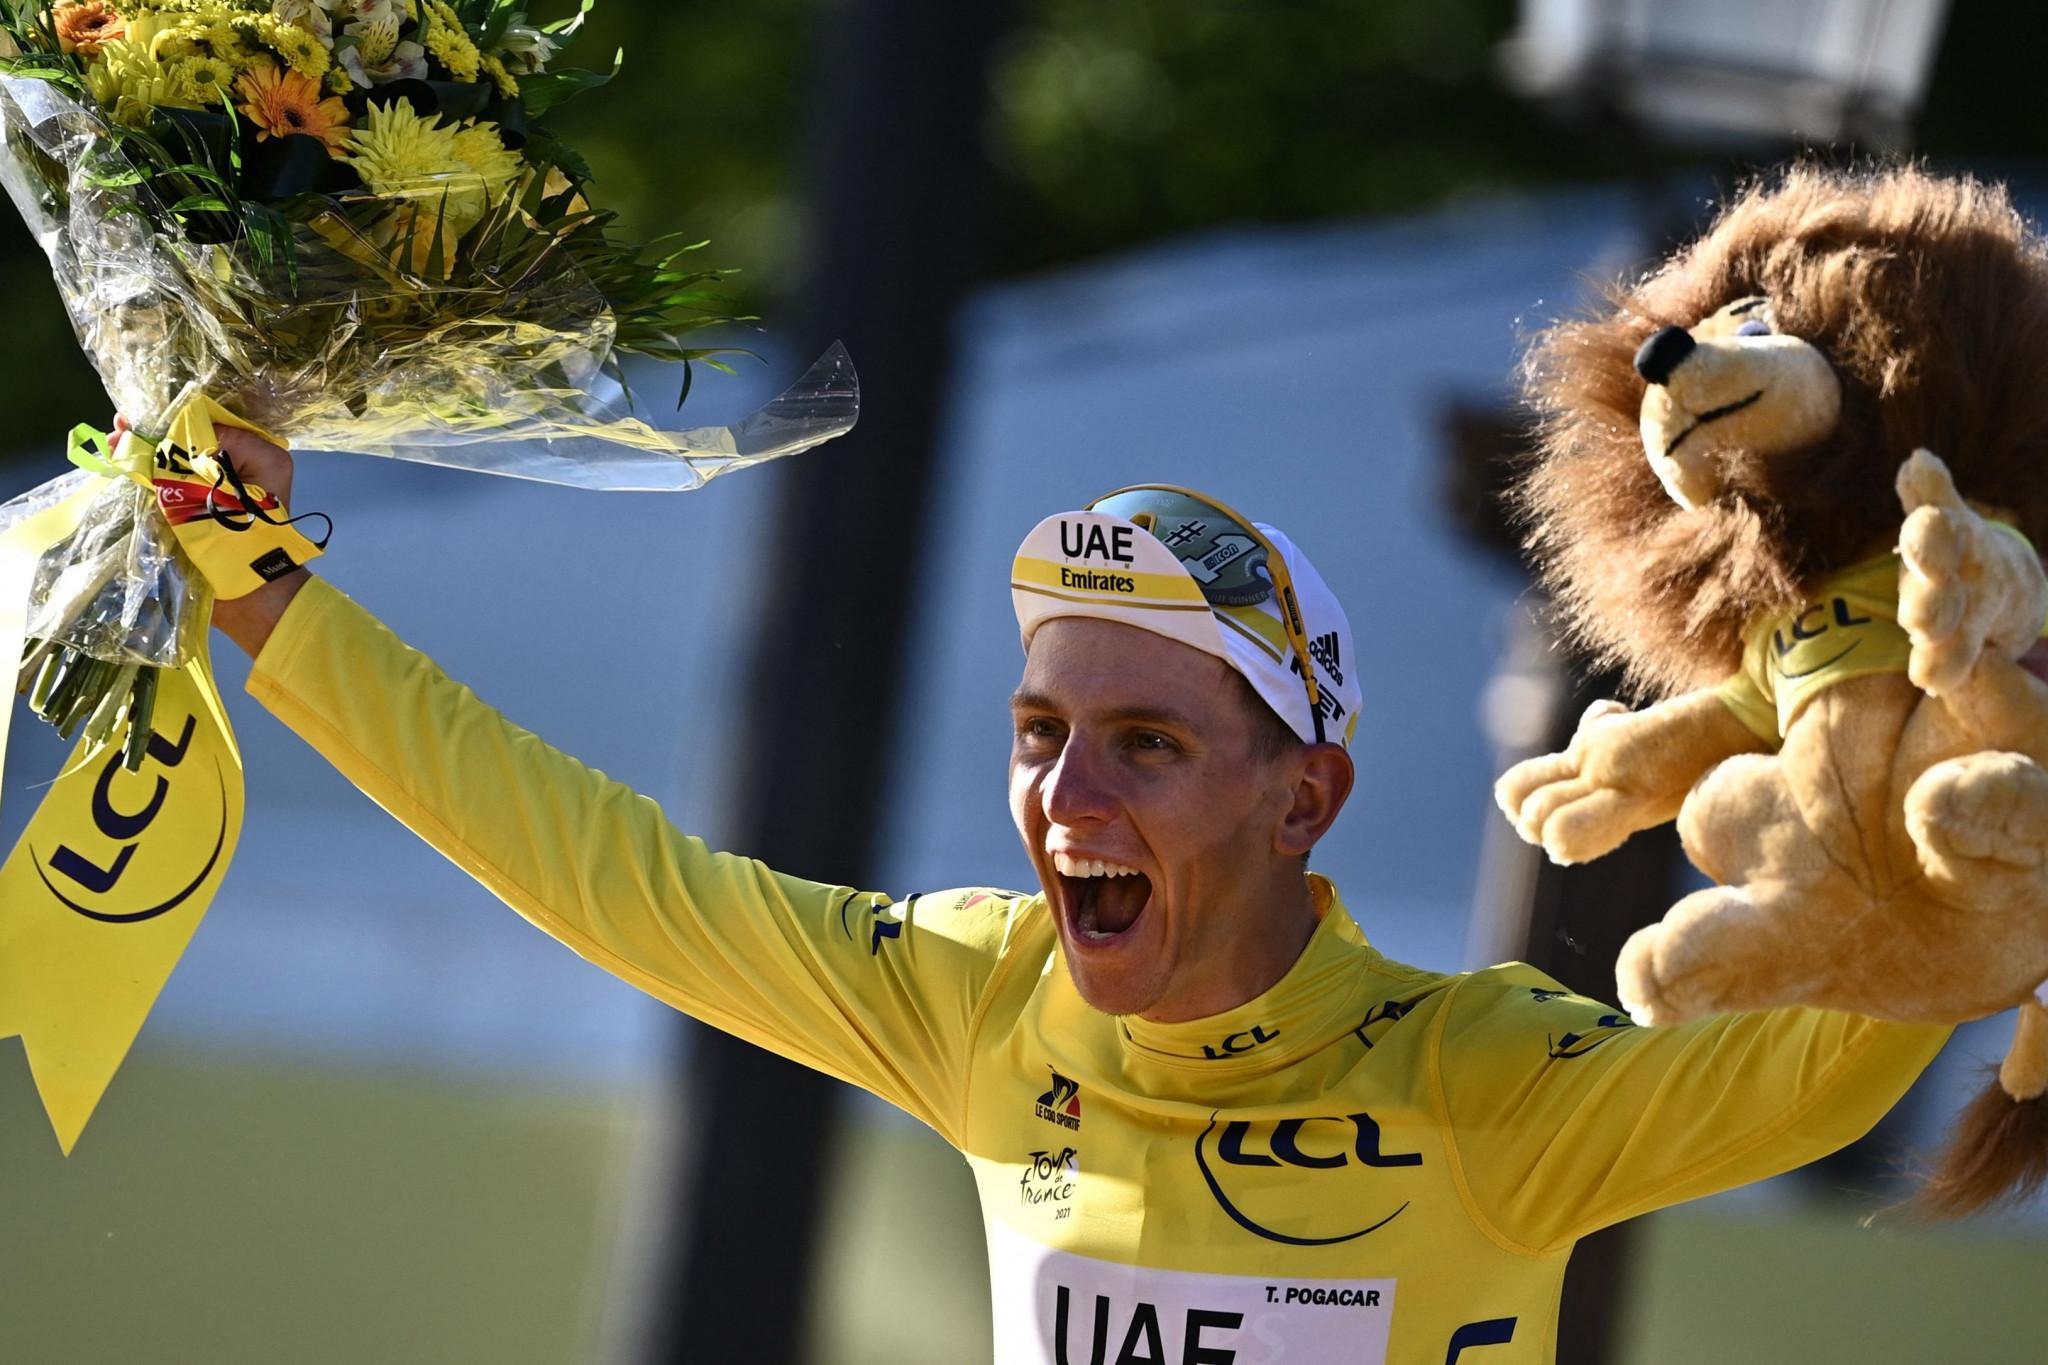 Tour de France champion Pogačar among starters at Tokyo 2020 men's road race